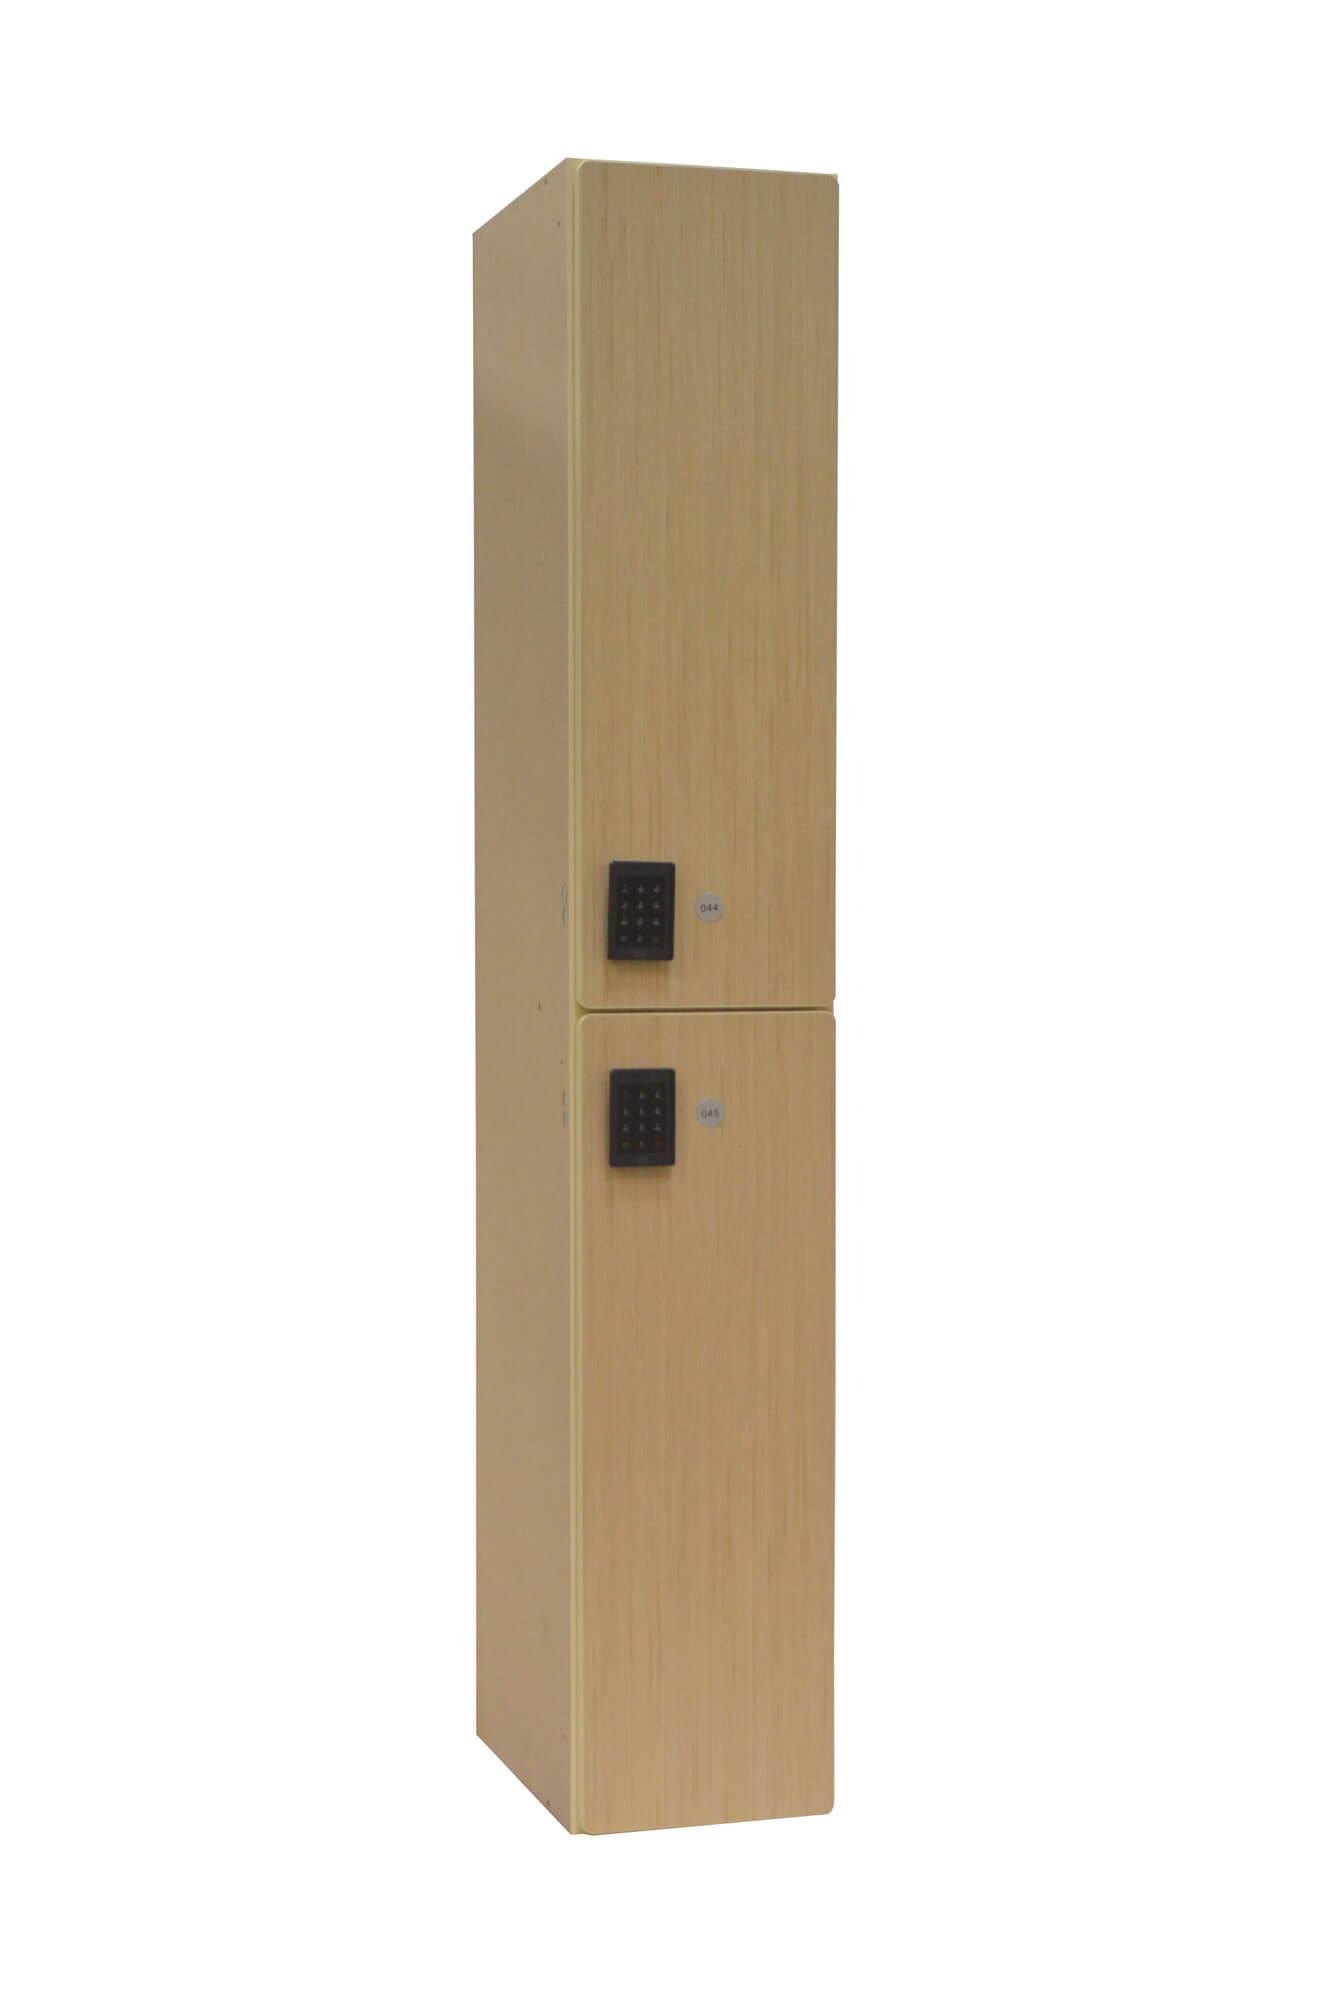 Ideal 1000 B Locker